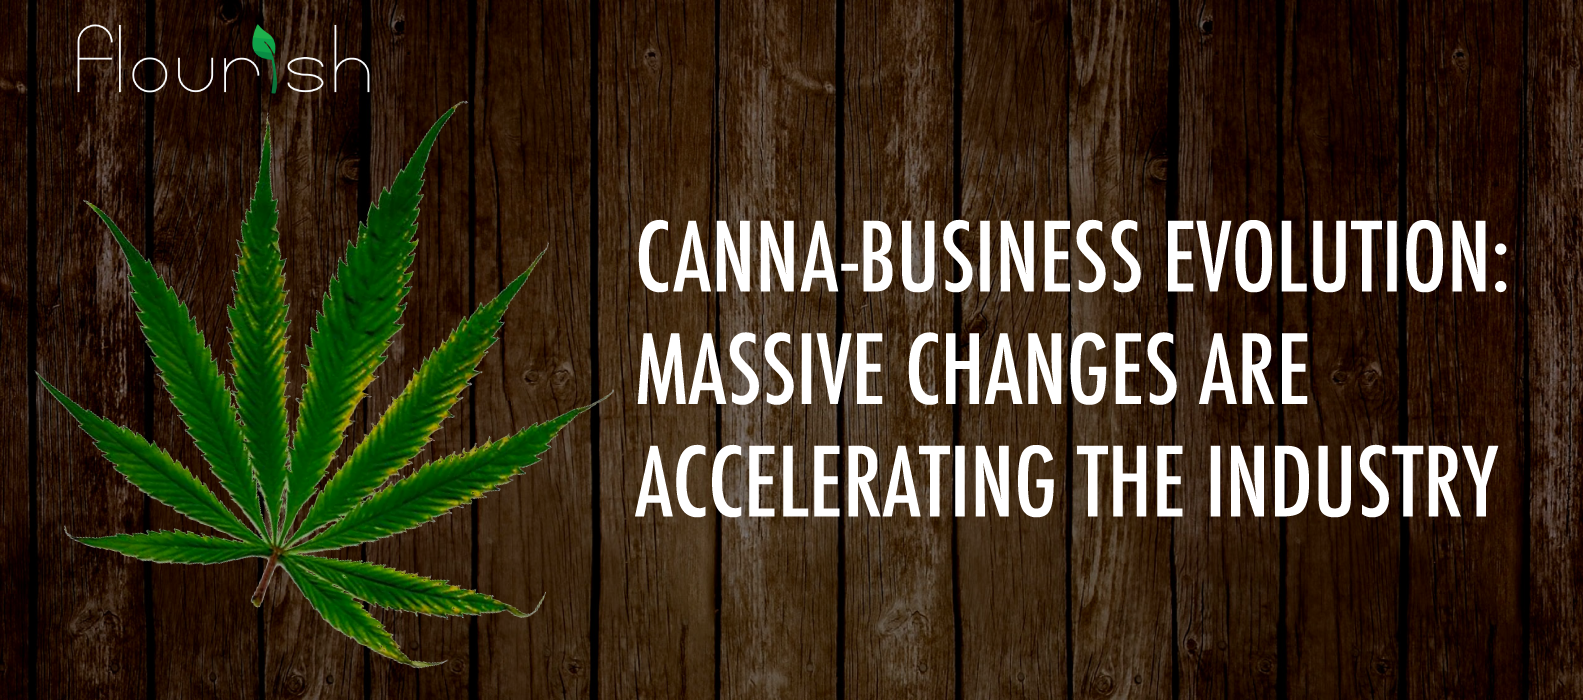 canna-business evolution